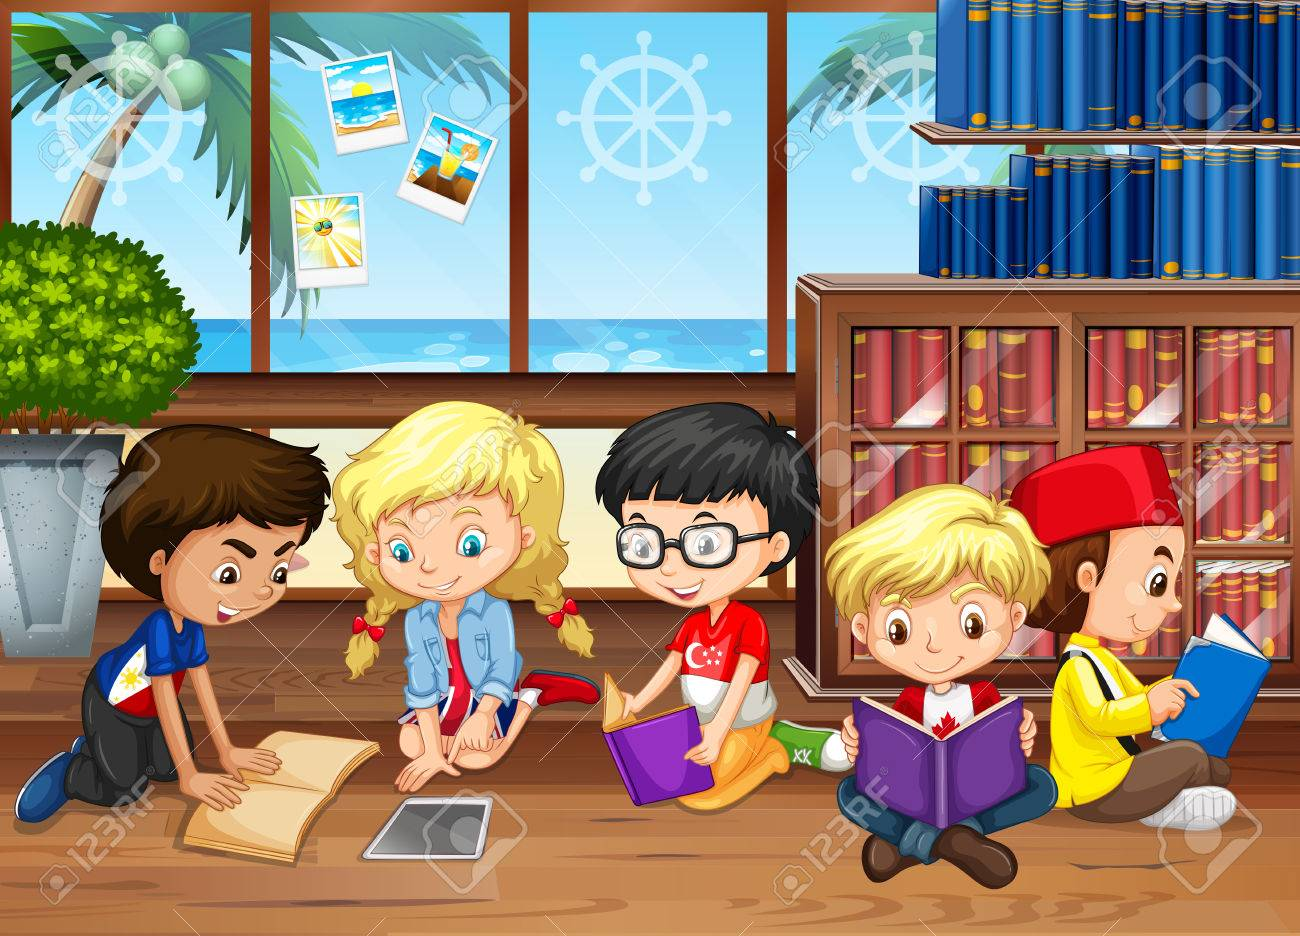 Children reading books in the library illustration.